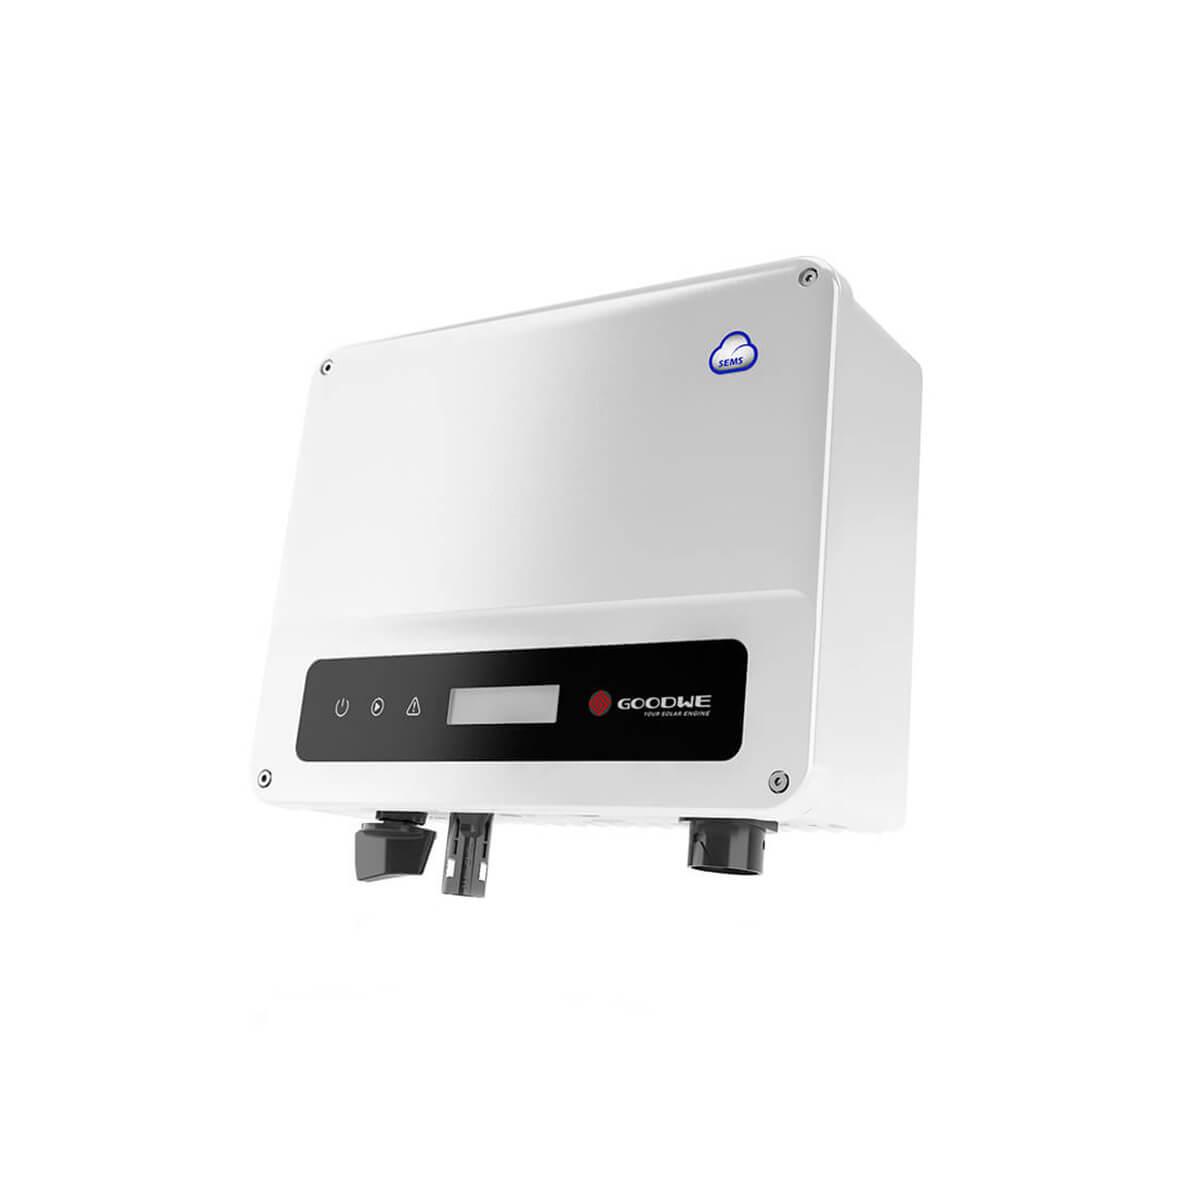 goodwe 1.5kW inverter, goodwe gw1500-xs 1.5kW inverter, goodwe gw1500-xs inverter, goodwe gw1500-xs, goodwe 1.5 kW, GOODWE 1.5 KW